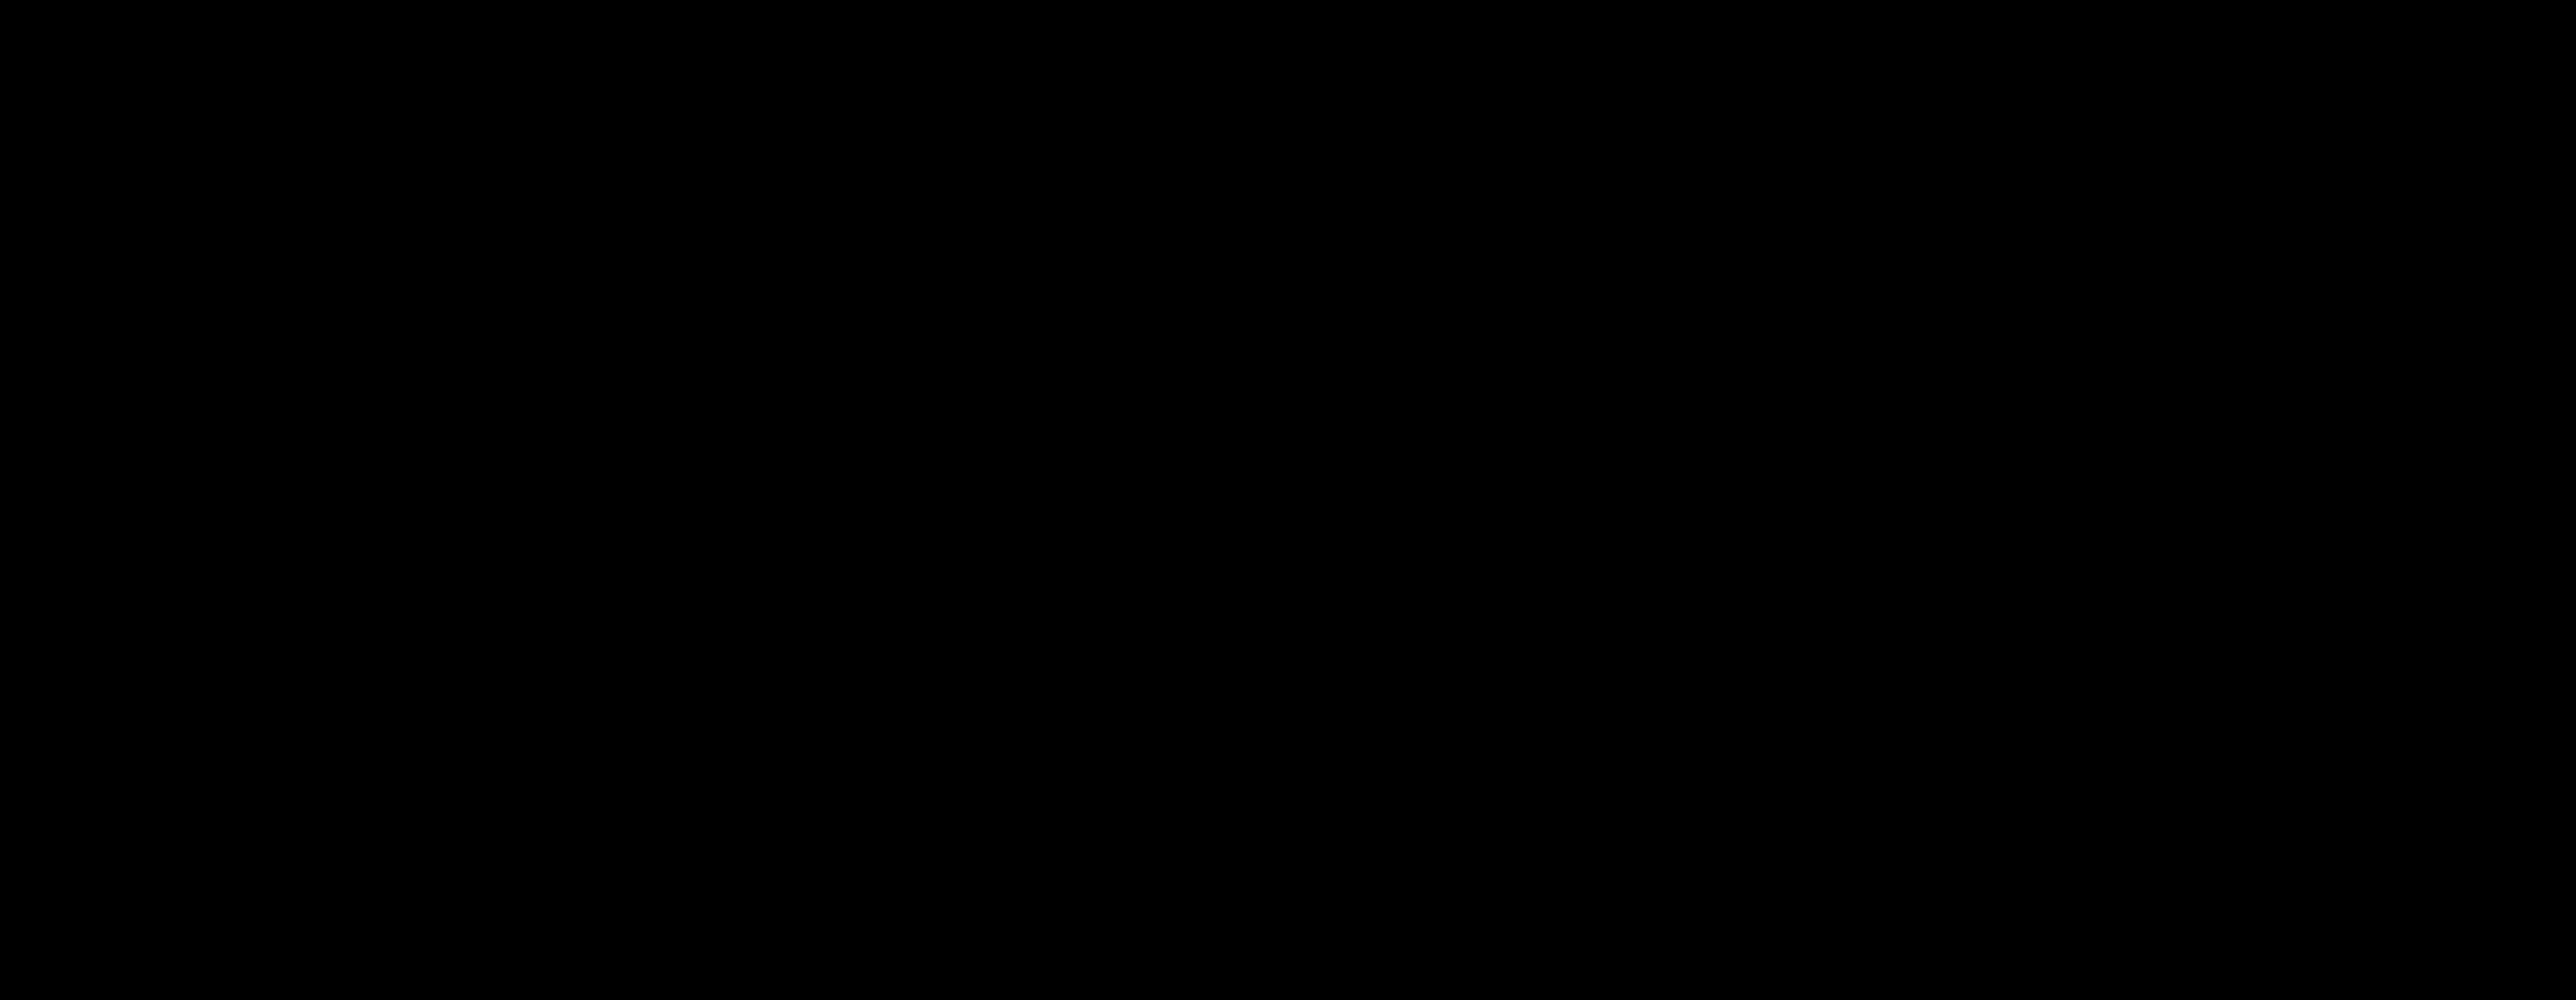 Help design our new tech company logo